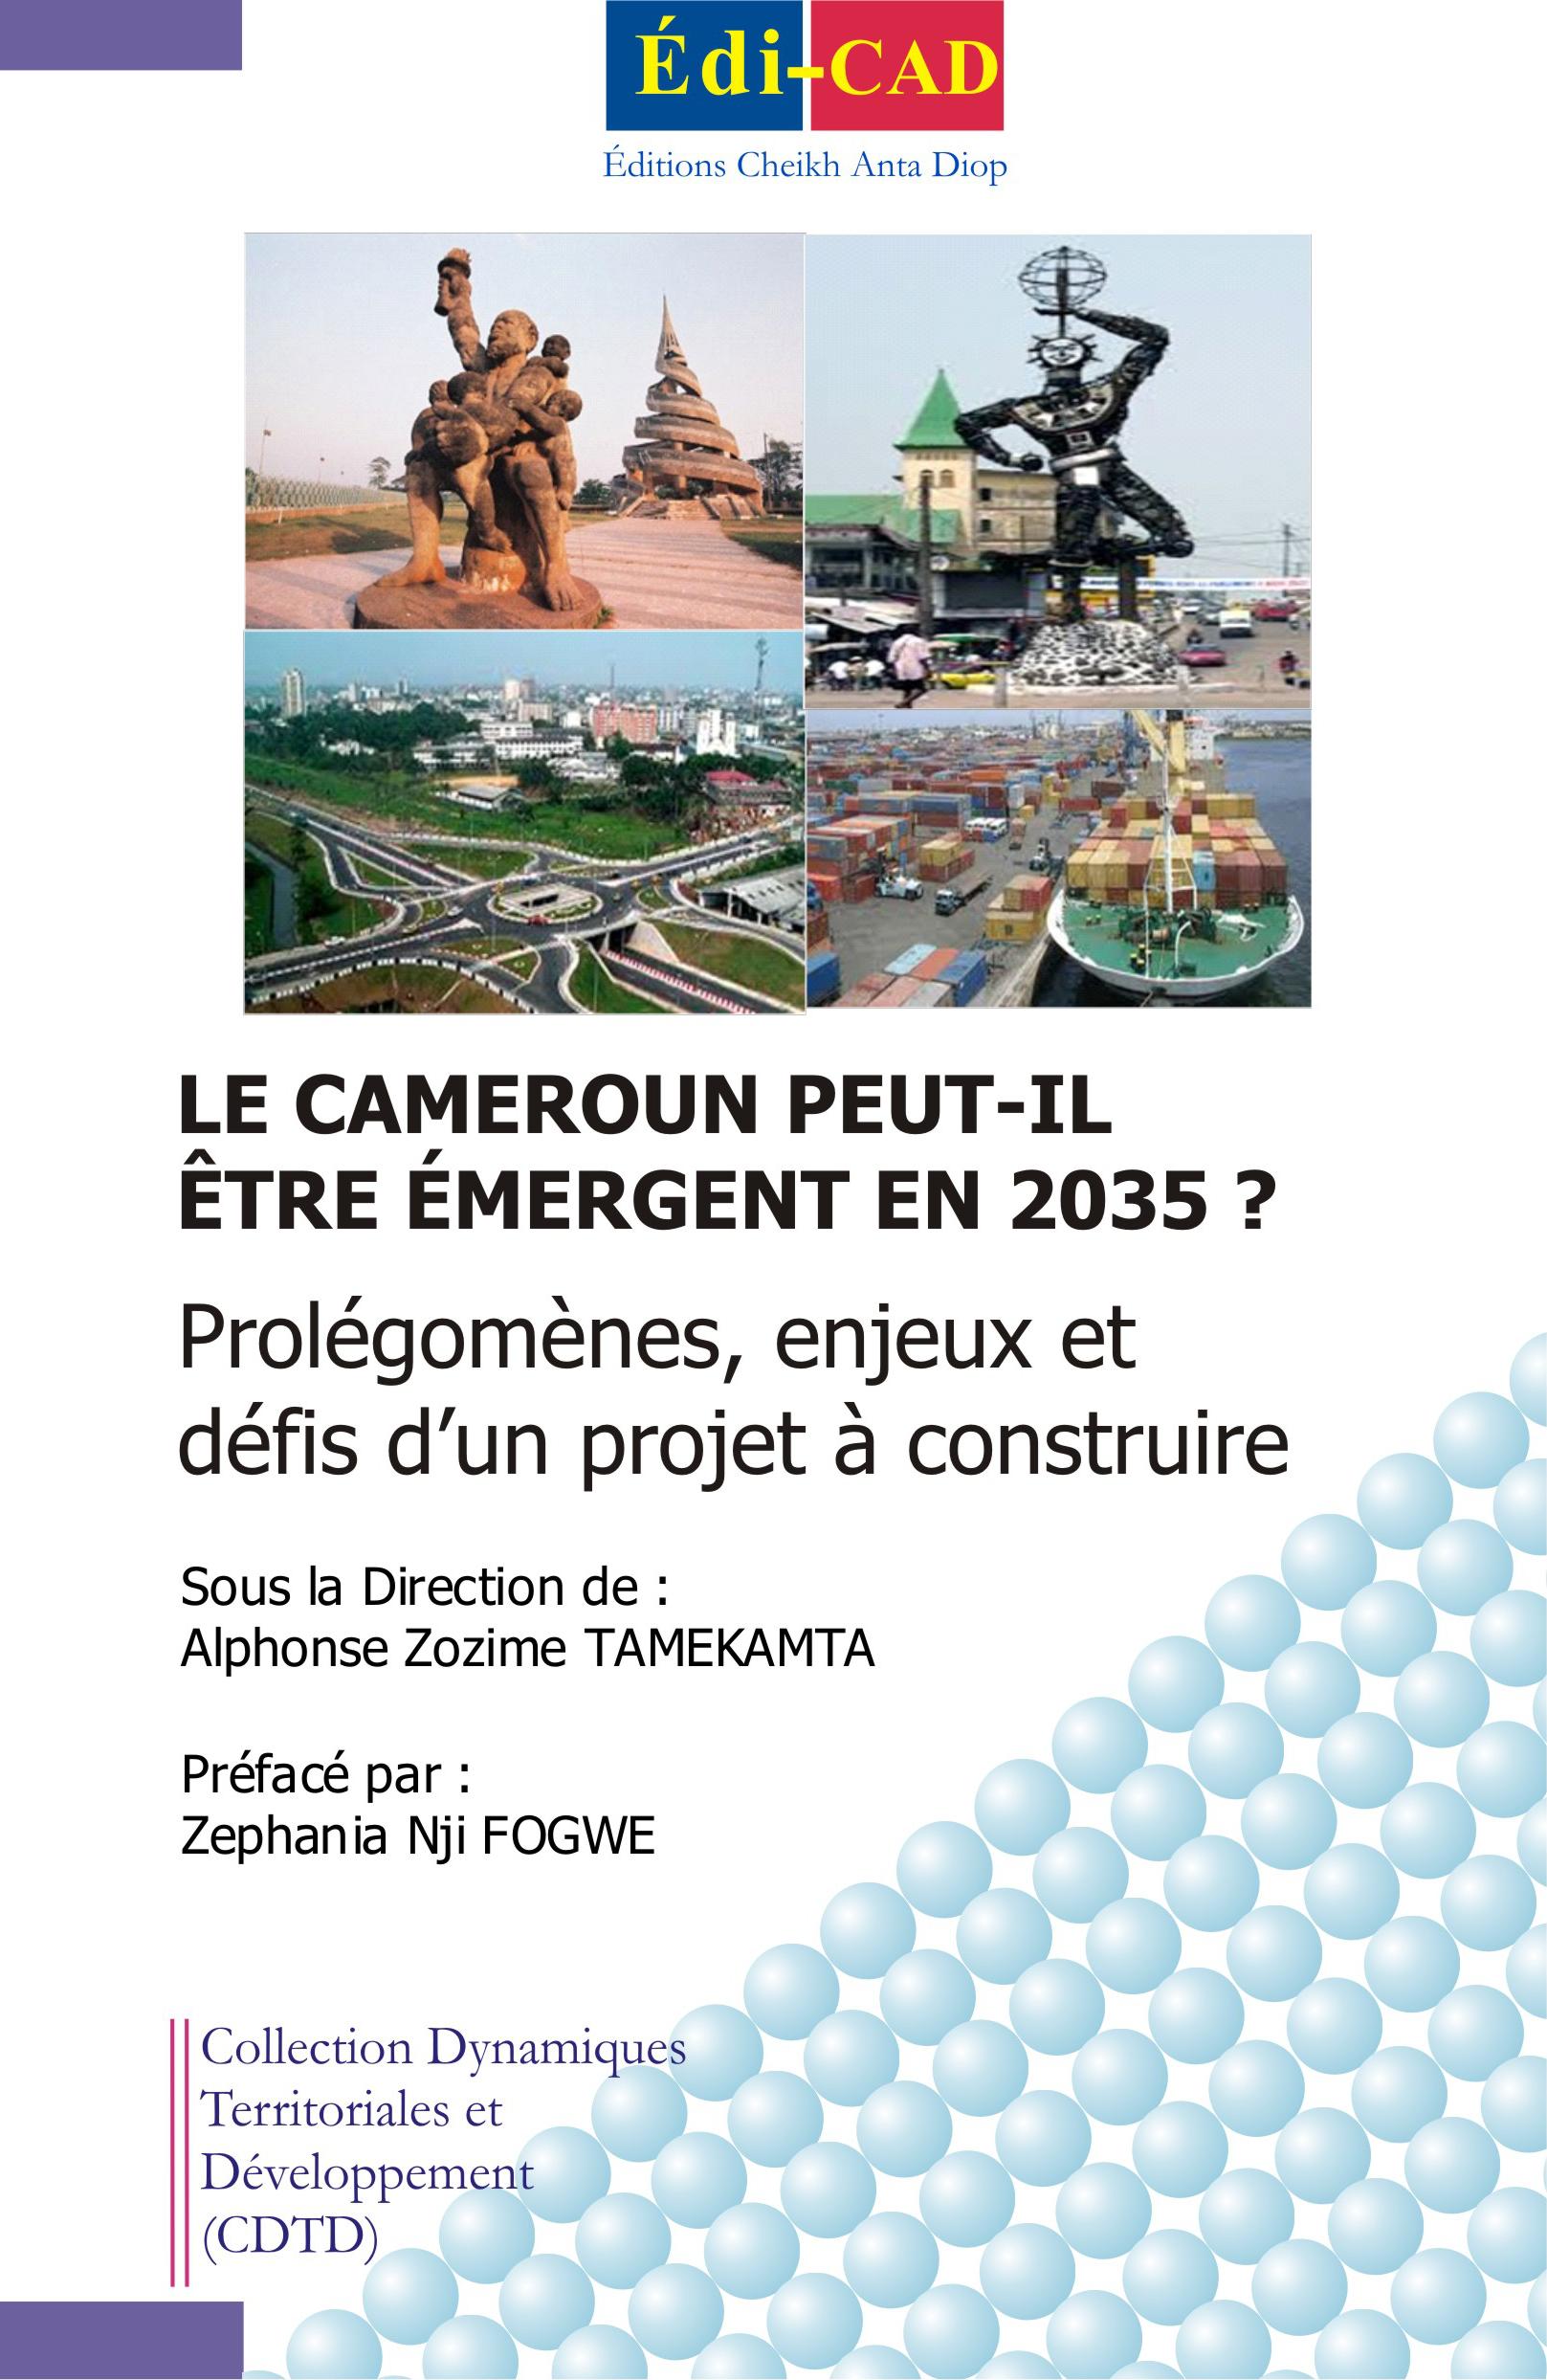 cmr emergent 2035